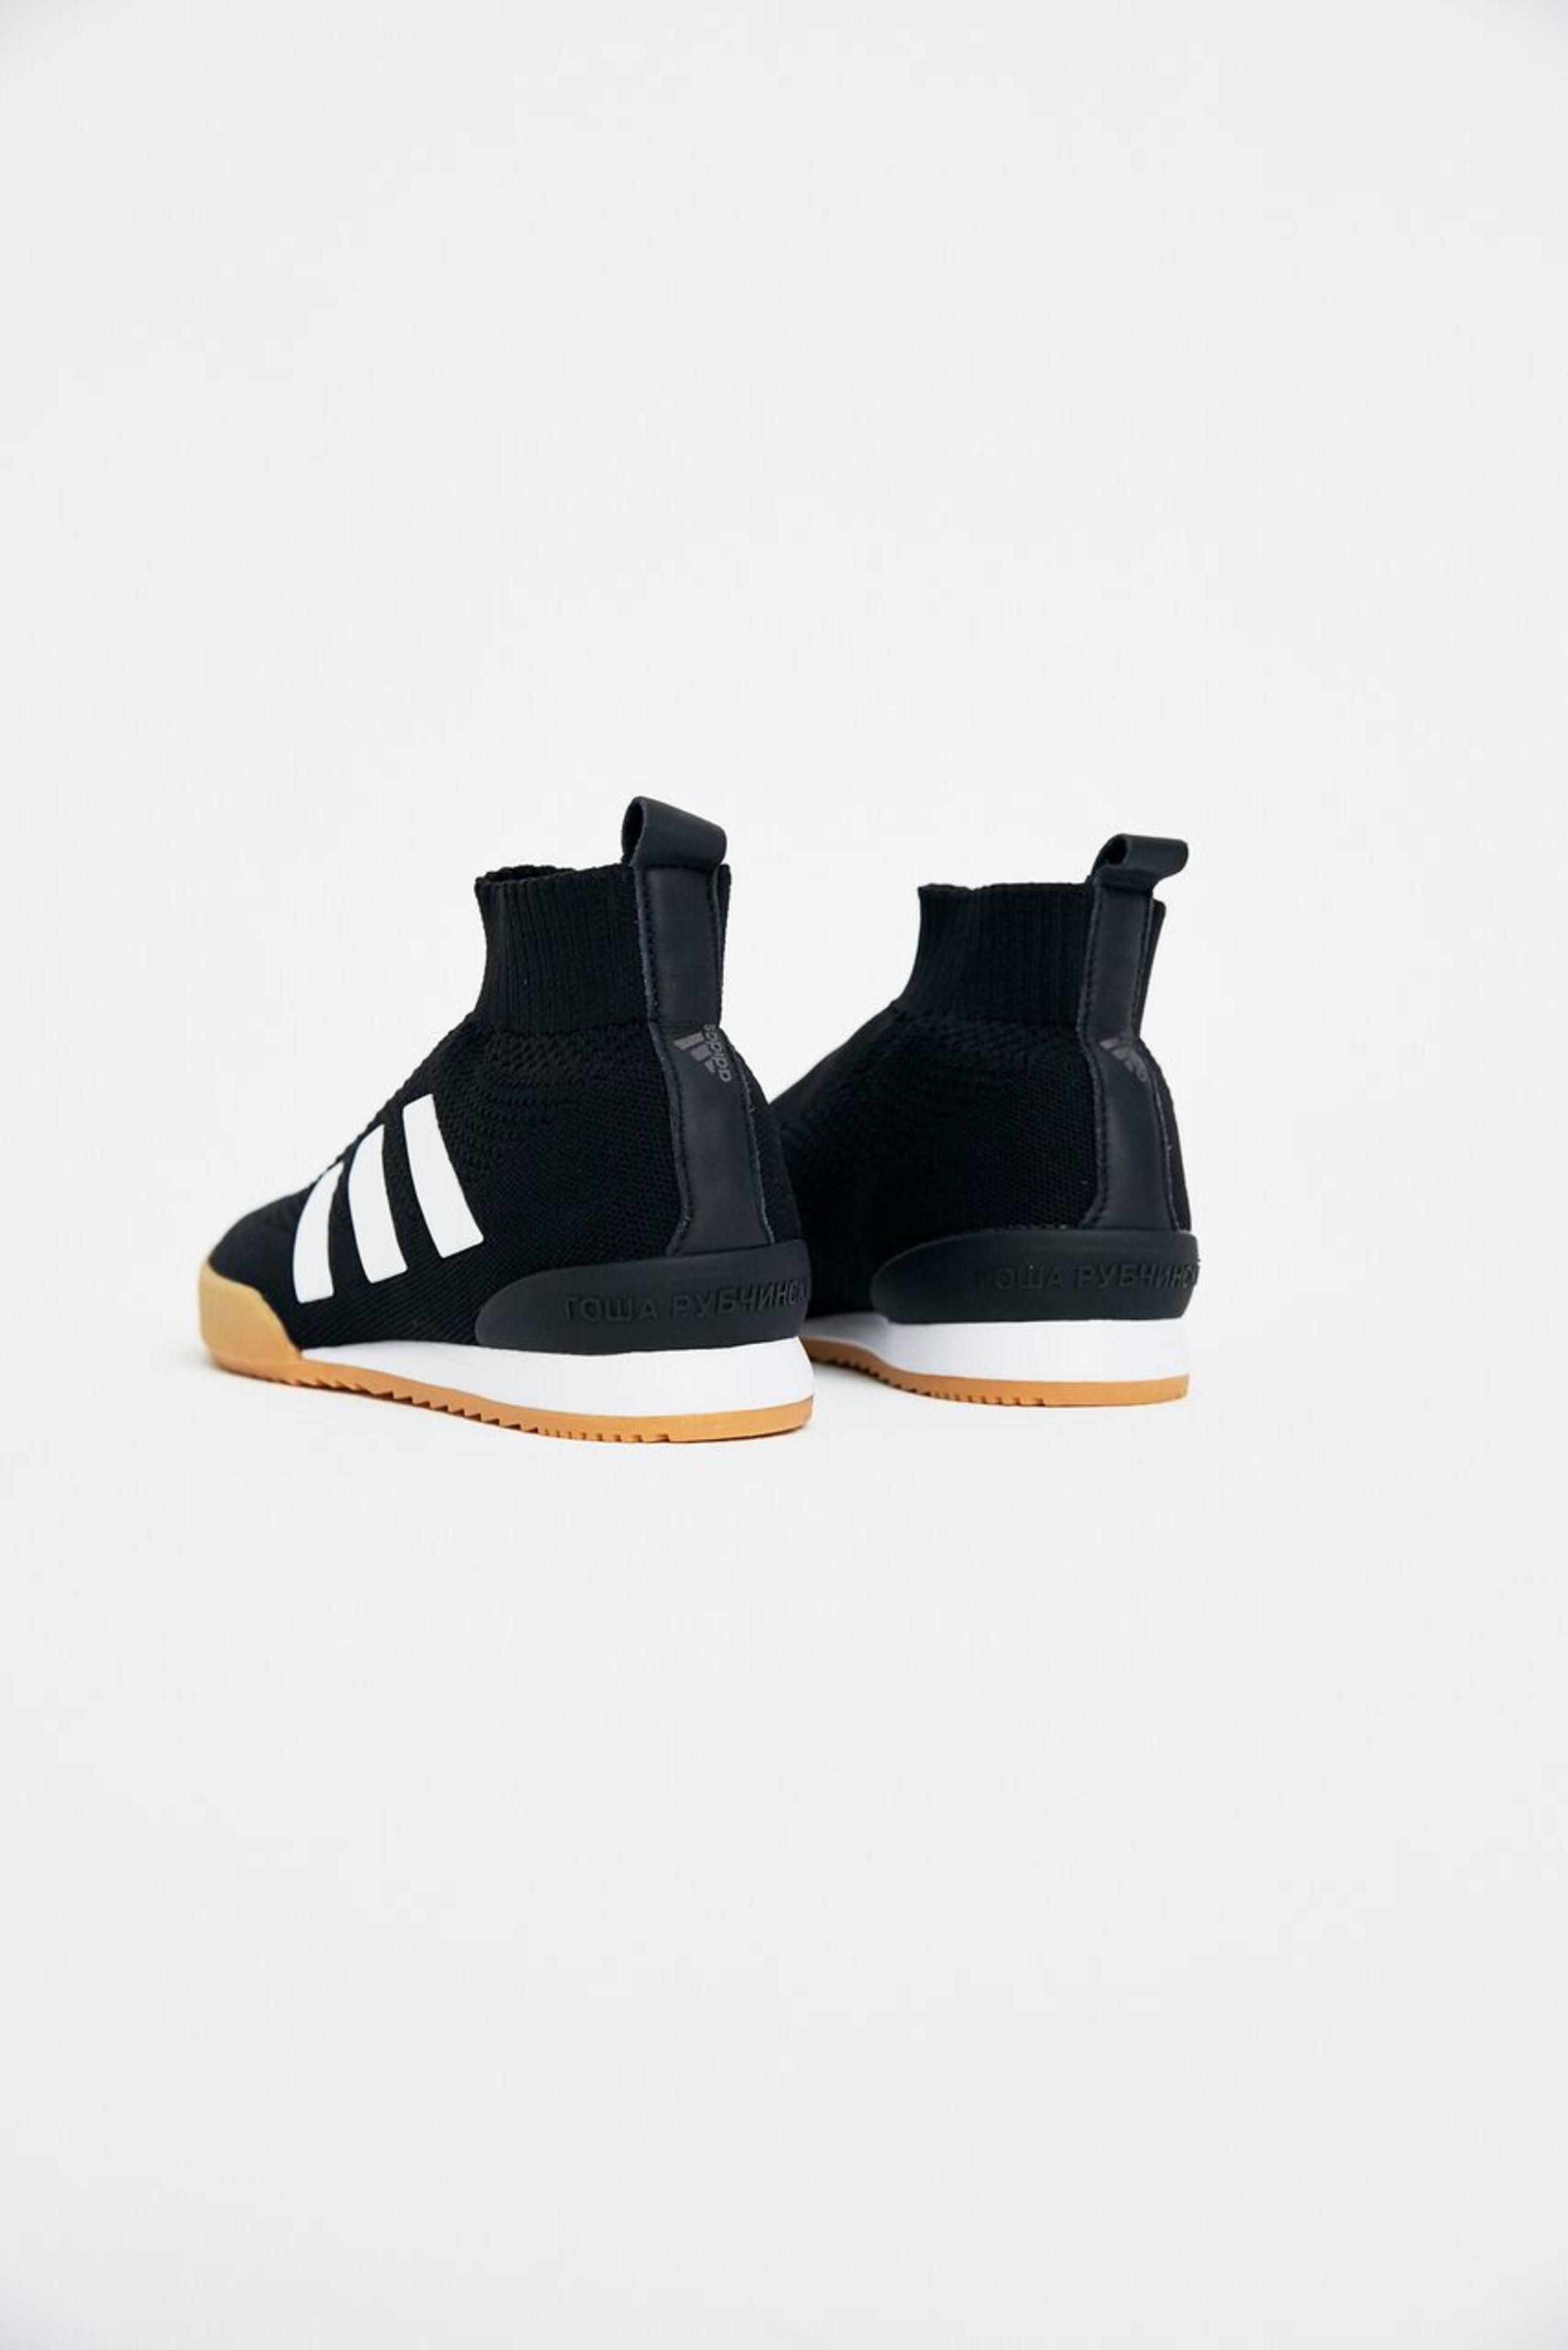 promo code e6de7 59155 Lyst - Gosha Rubchinskiy Black Ace 16+ Super Shoes in Black